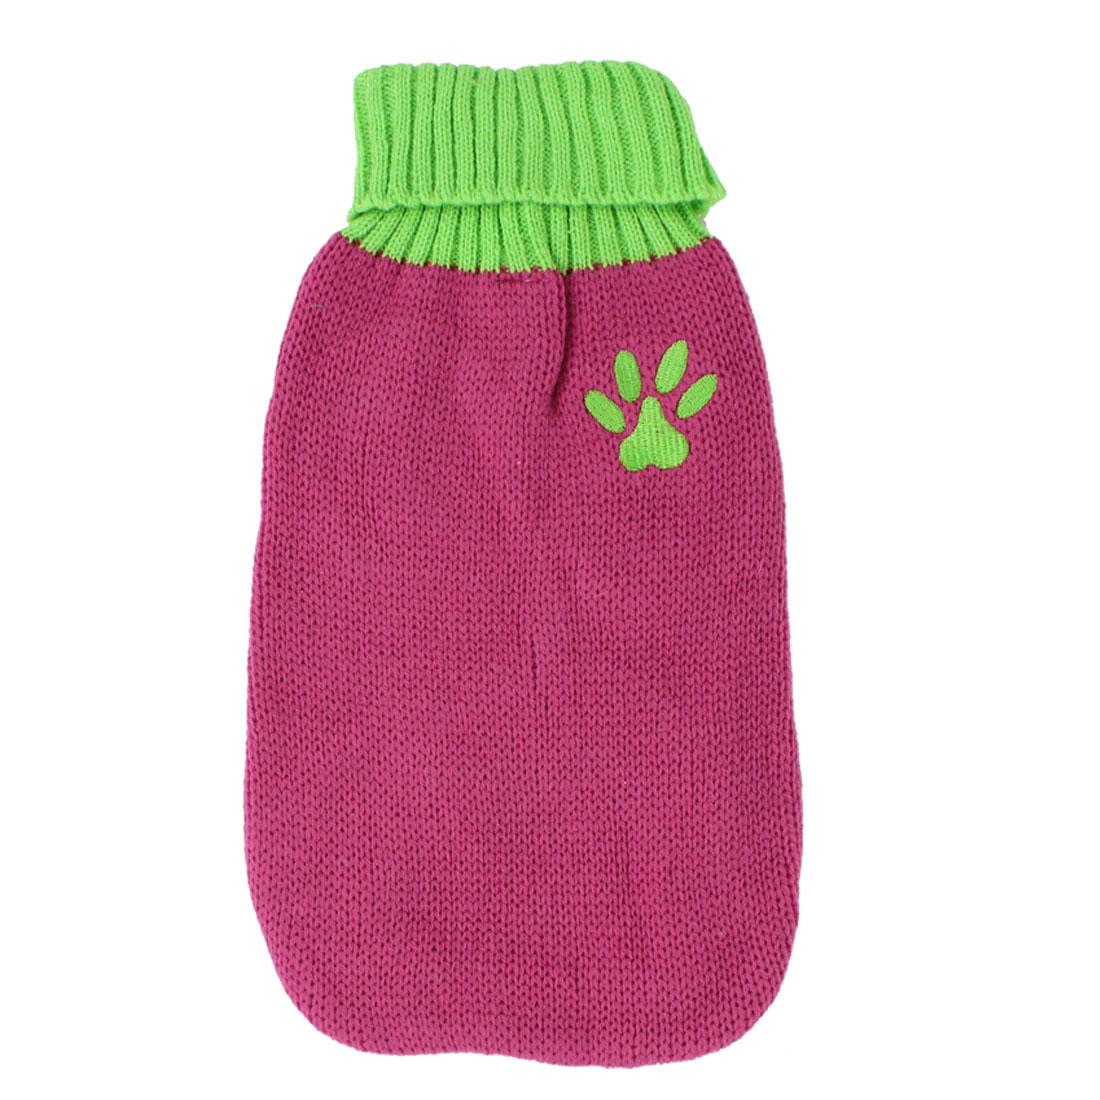 Pet Dog Doggy Ribbed Cuff Knitwear Turtleneck Apparel Sweater Fuchsia Yellow Green Size S